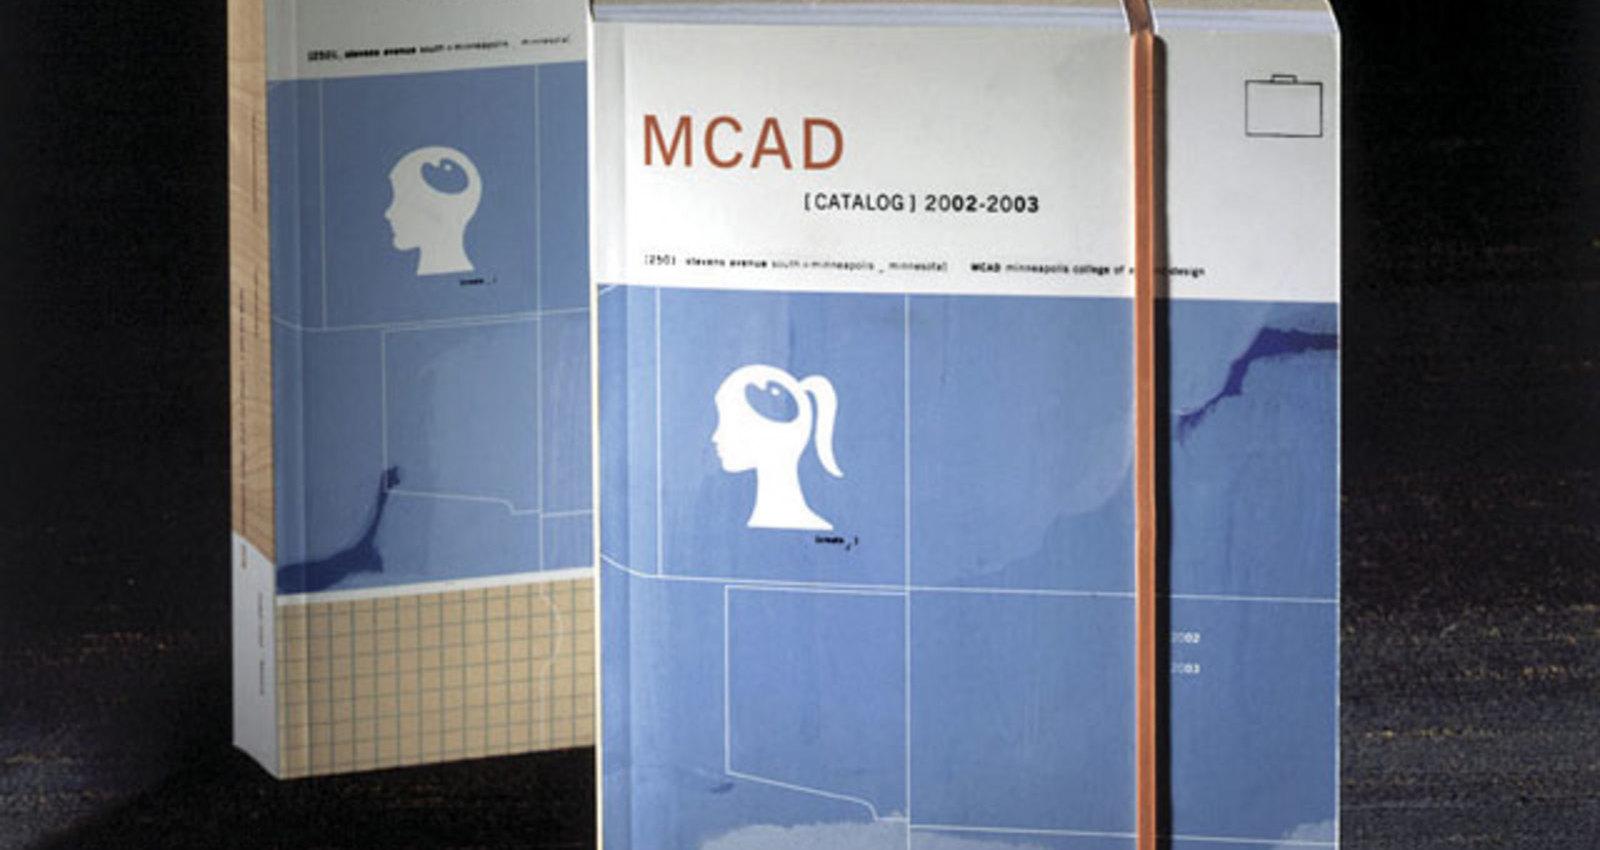 Minneapolis College of Art and Design Admissions Catalog